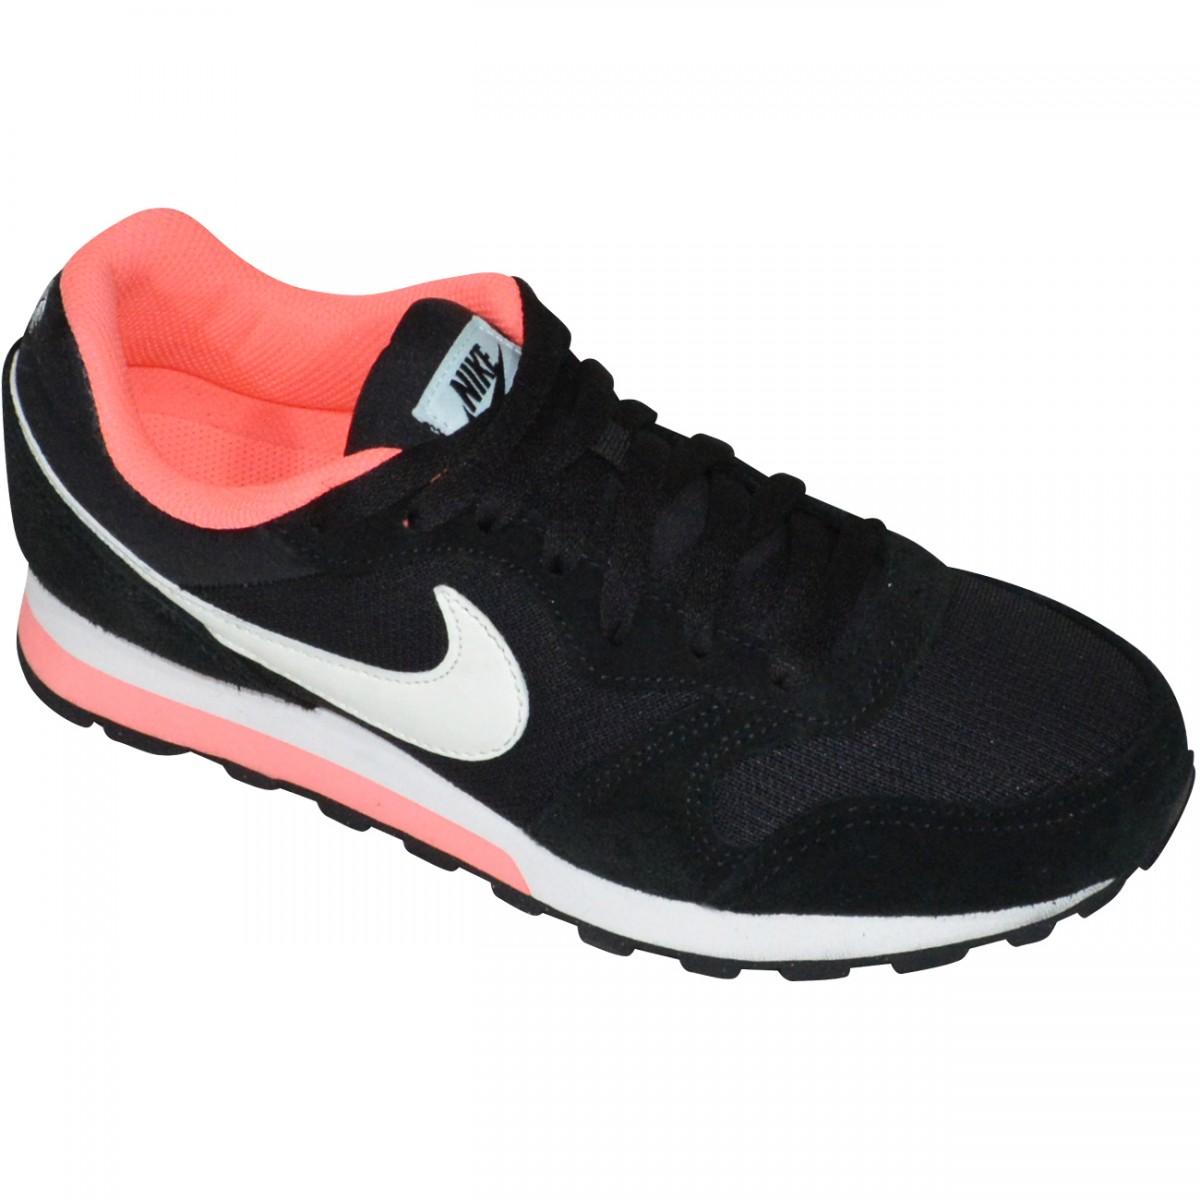 ade5ca6429 Tenis Nike MD Runner 2 749869 004 - Preto Branco Rosa - Chuteira Nike